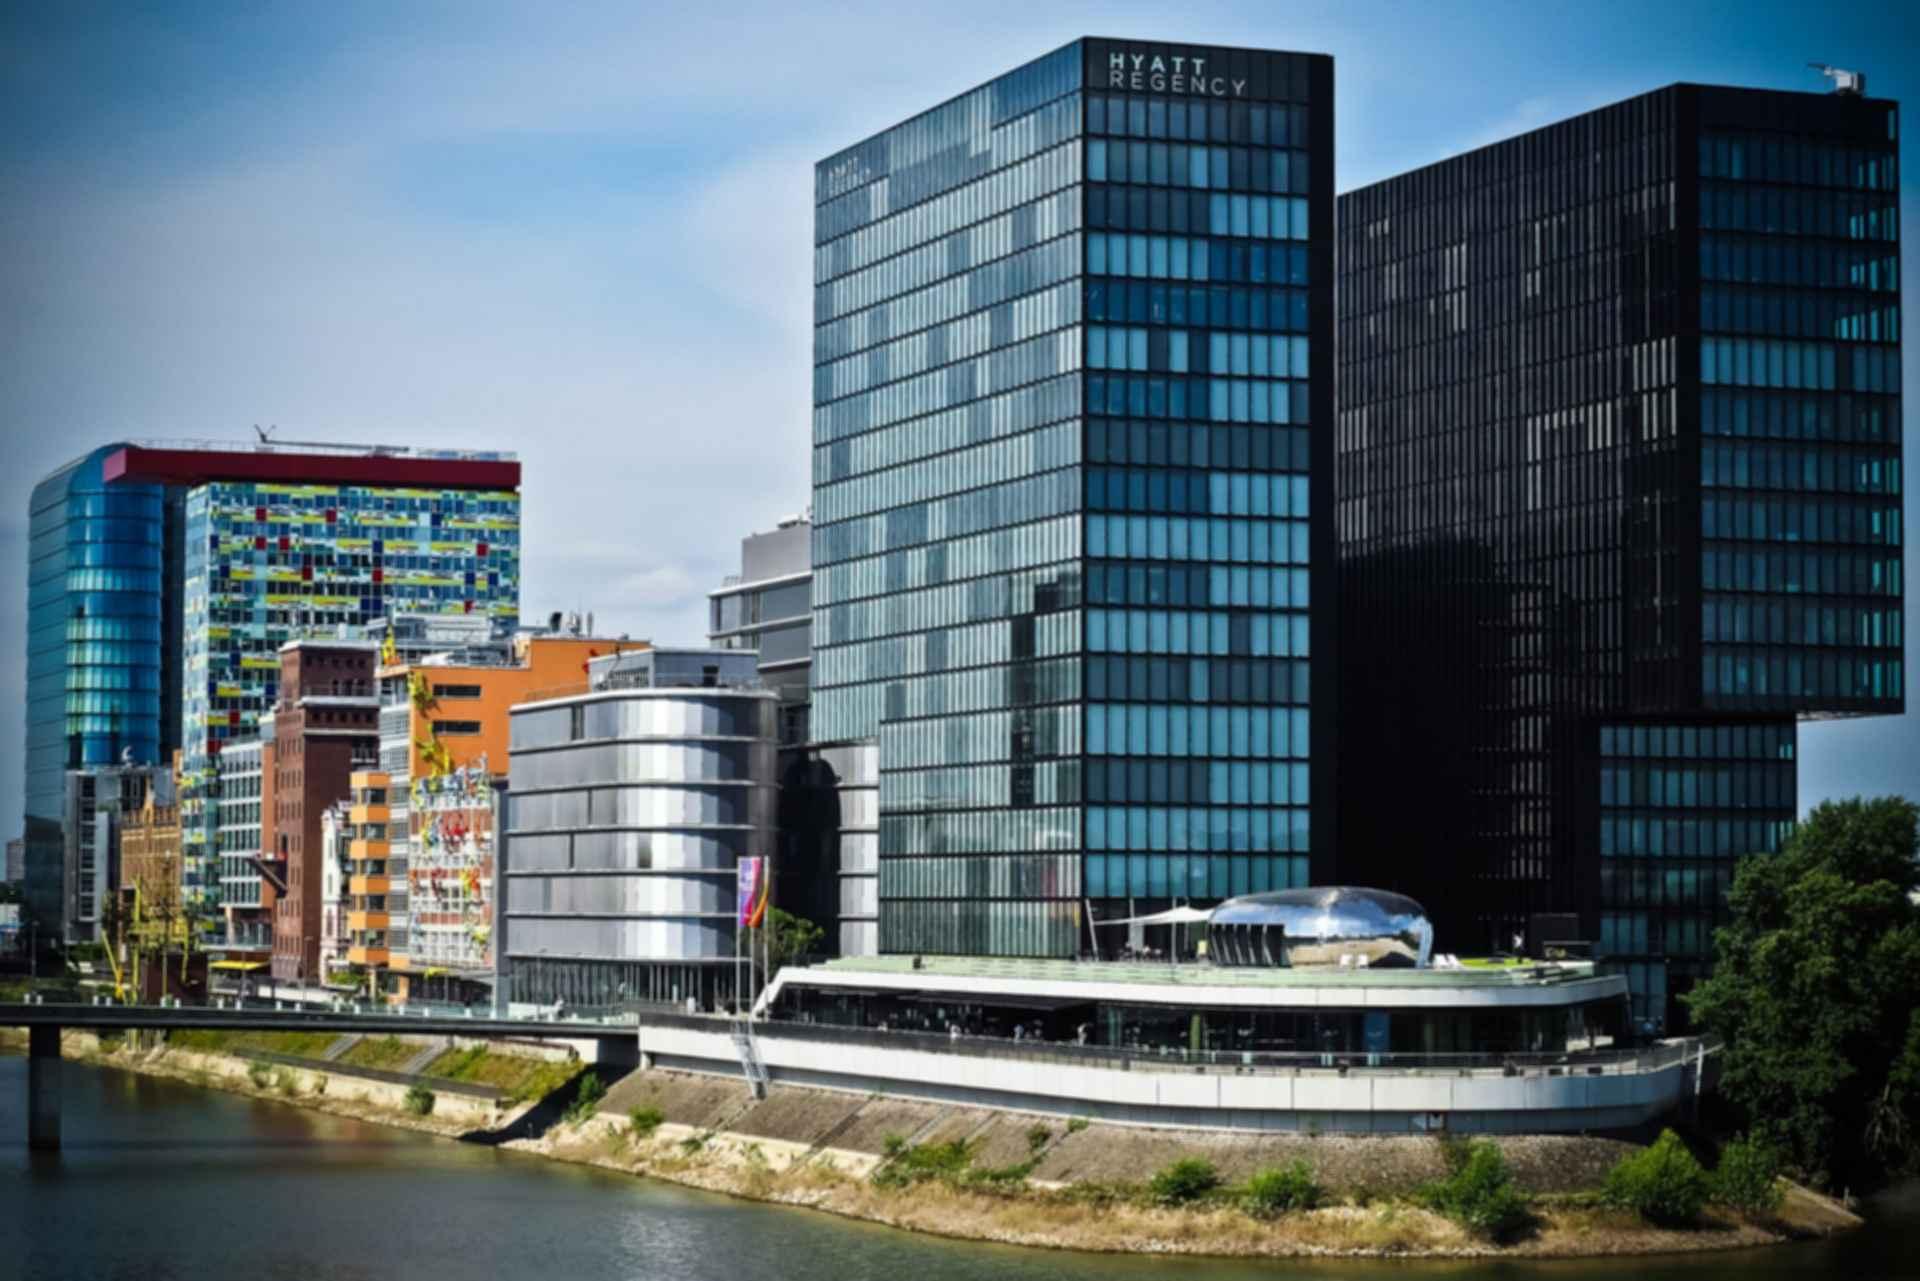 Hyatt Regency Hotel Dusseldorf